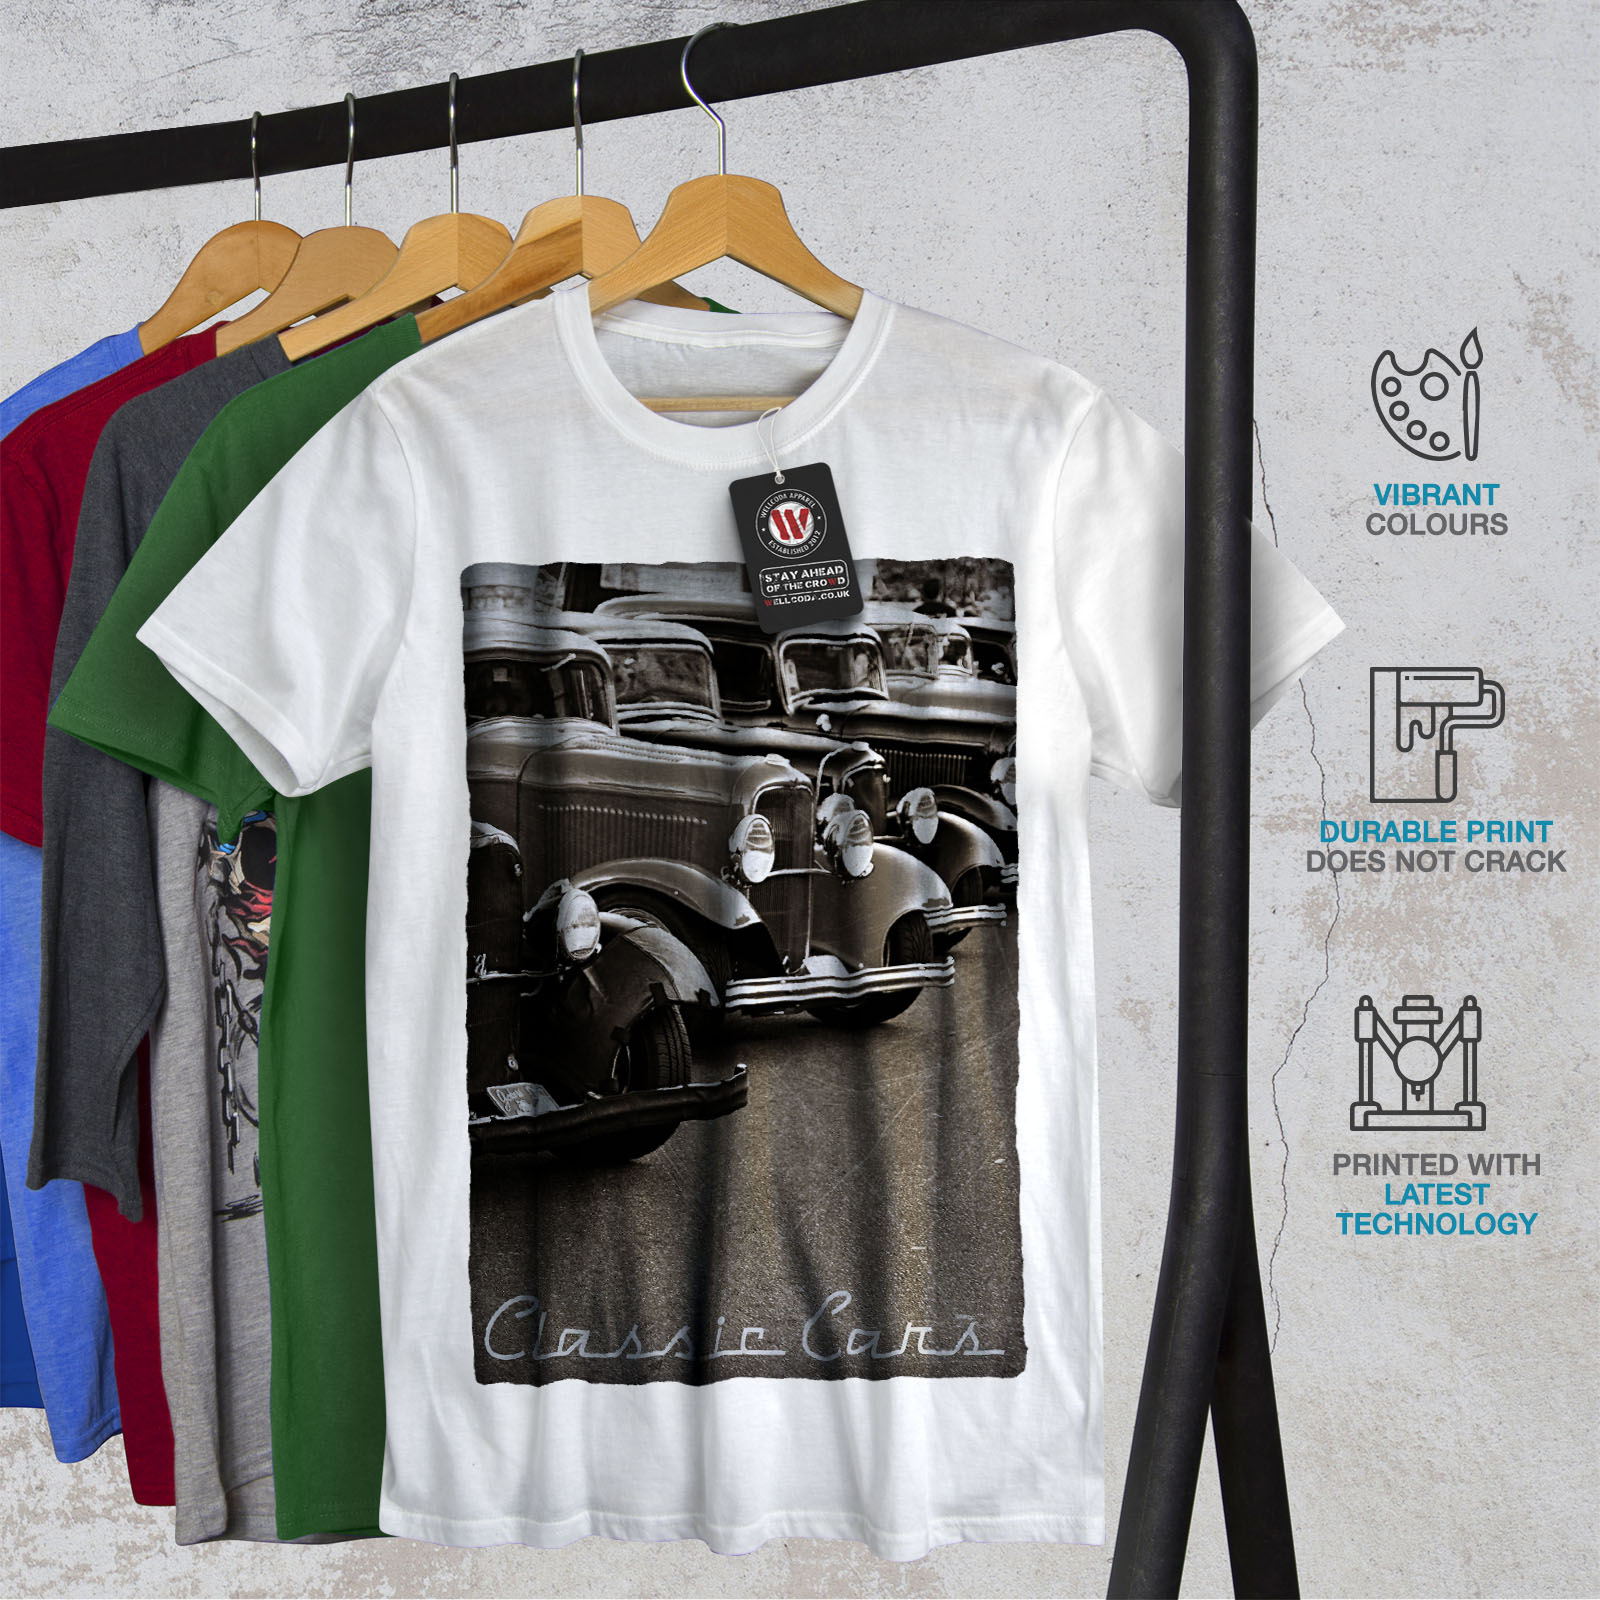 Wellcoda-Classic-Cars-Mens-T-shirt-Retro-Graphic-Design-Printed-Tee thumbnail 12